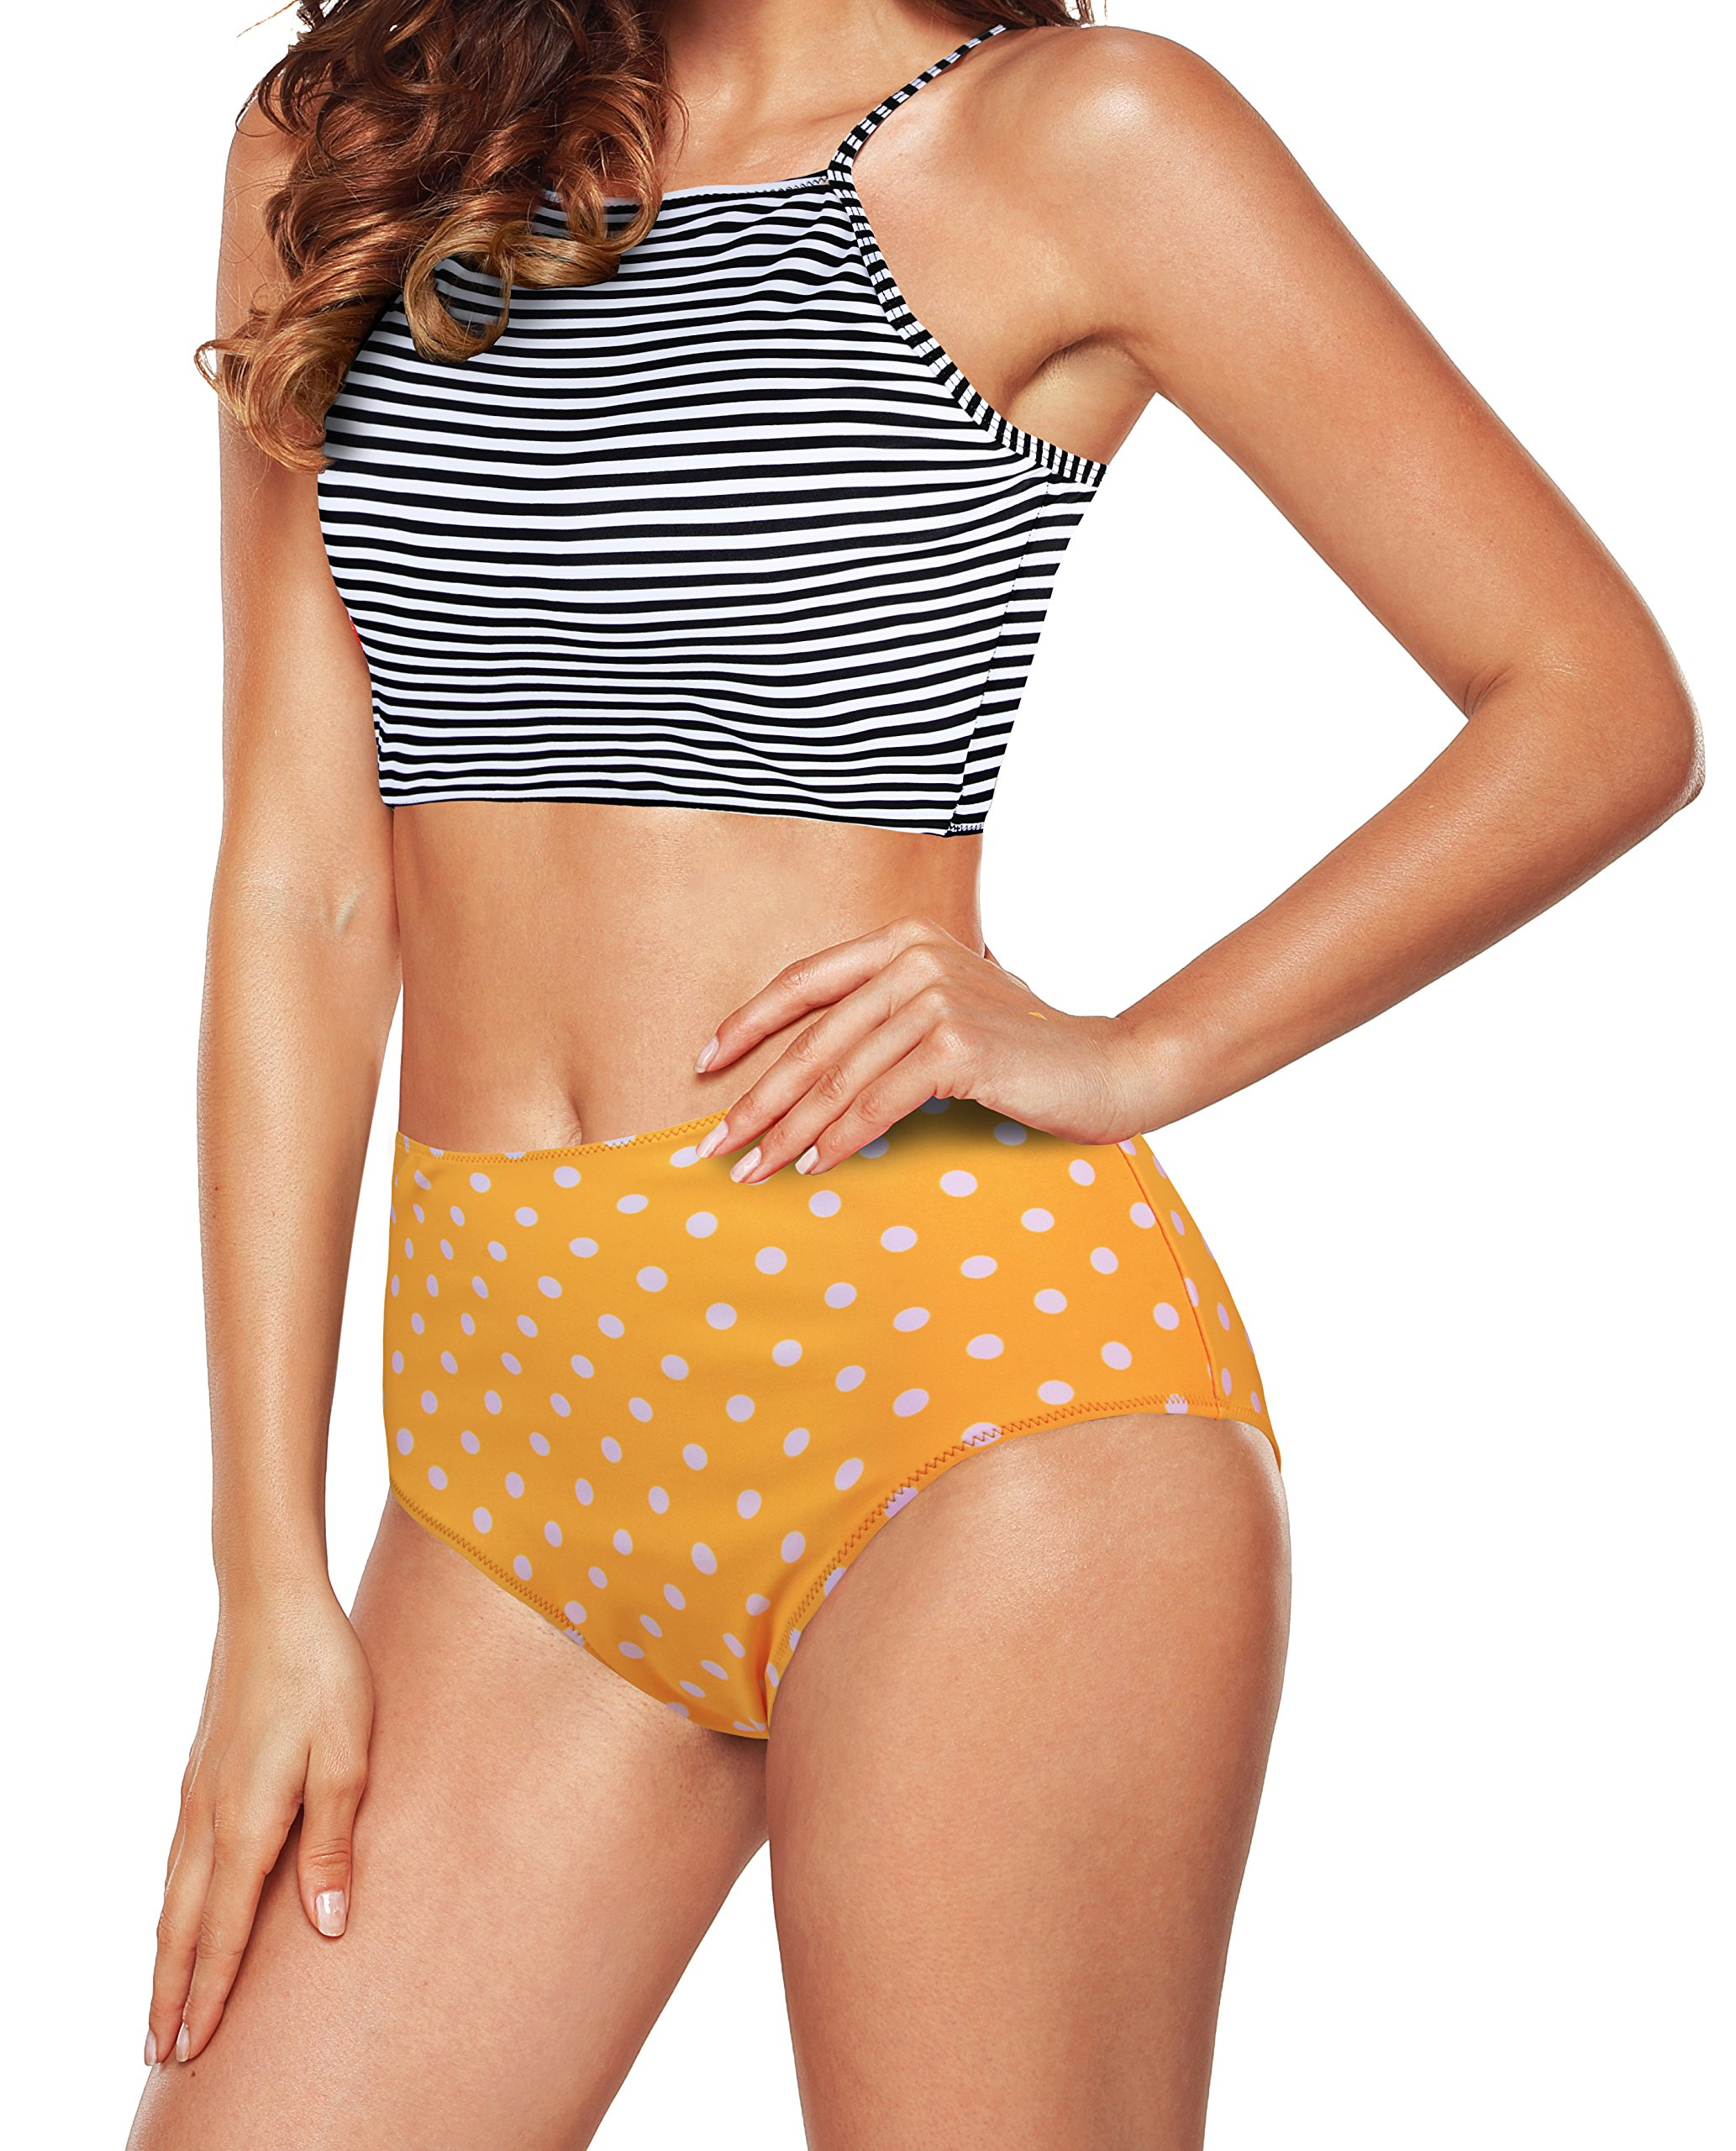 0835adf28e Galleon - Angerella Womens Yellow Retro Classic Crop Top Bikini Two Piece  Swimsuit Banded Swimwear